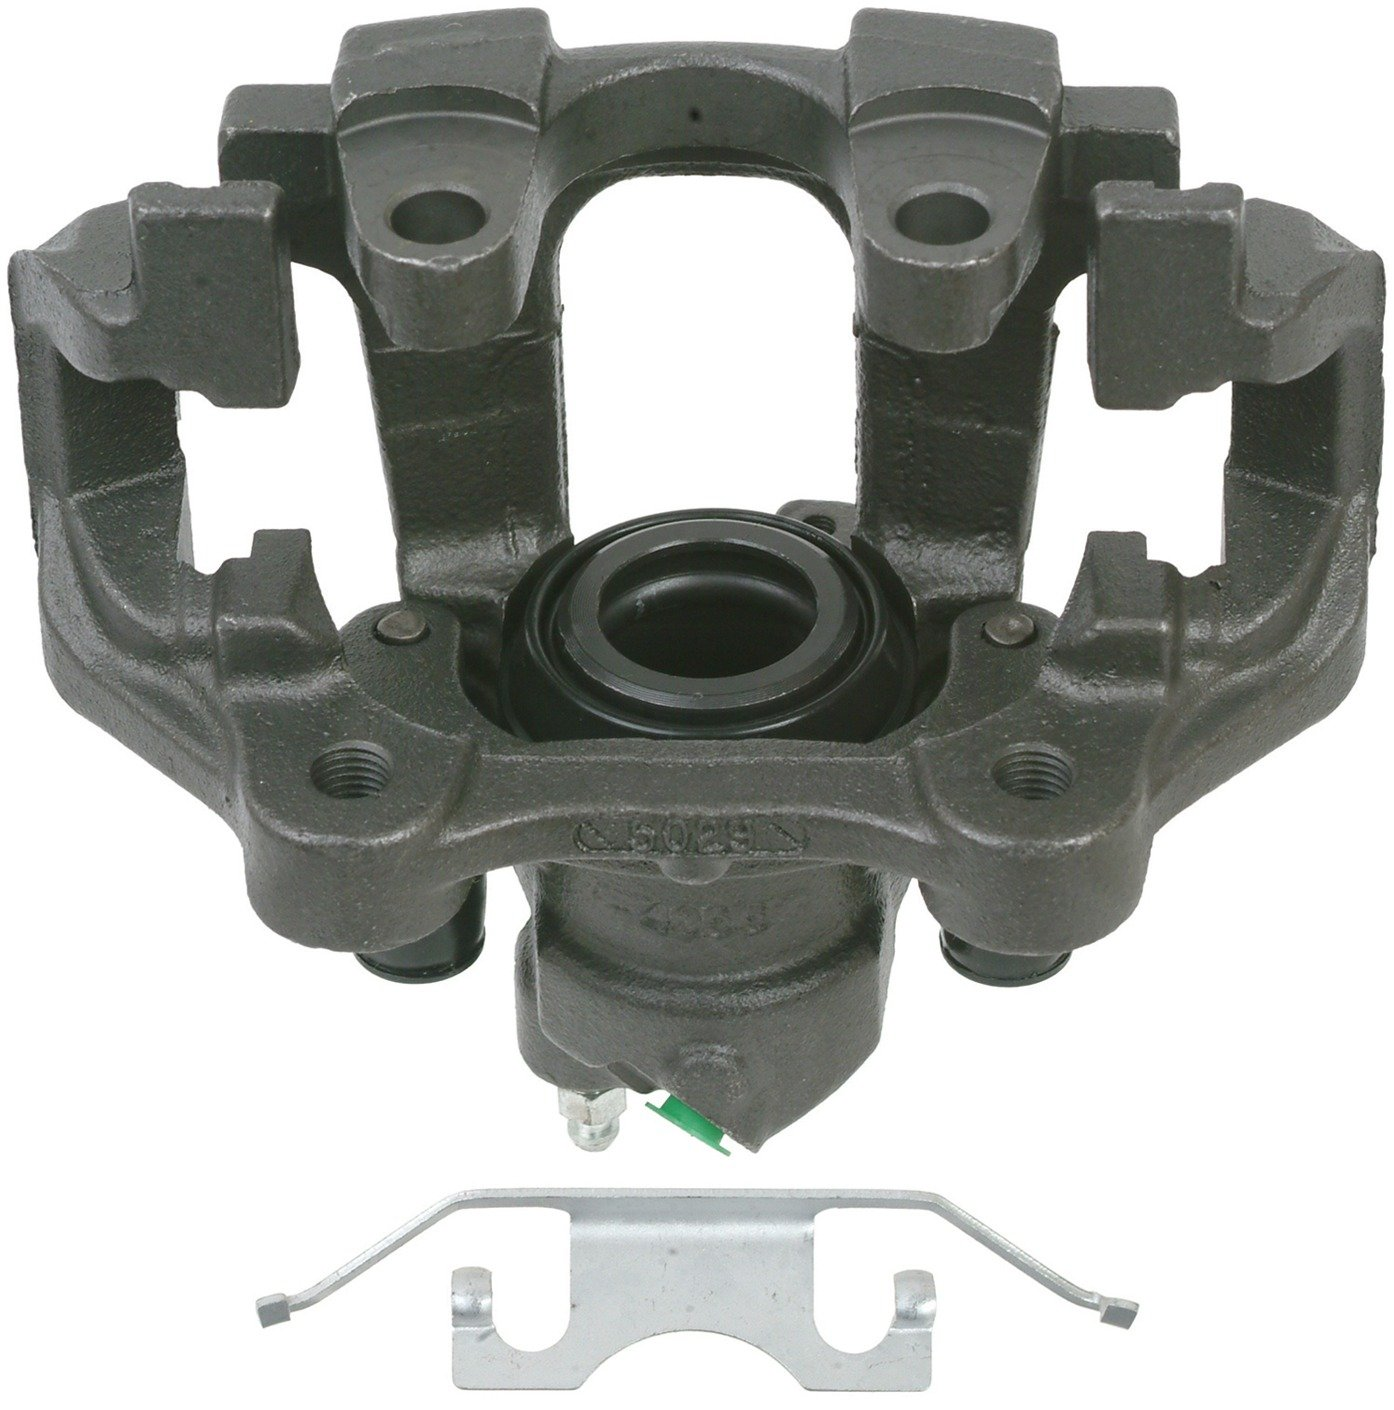 Cardone 19-B3315 Remanufactured Import Friction Ready Unloaded Brake Caliper